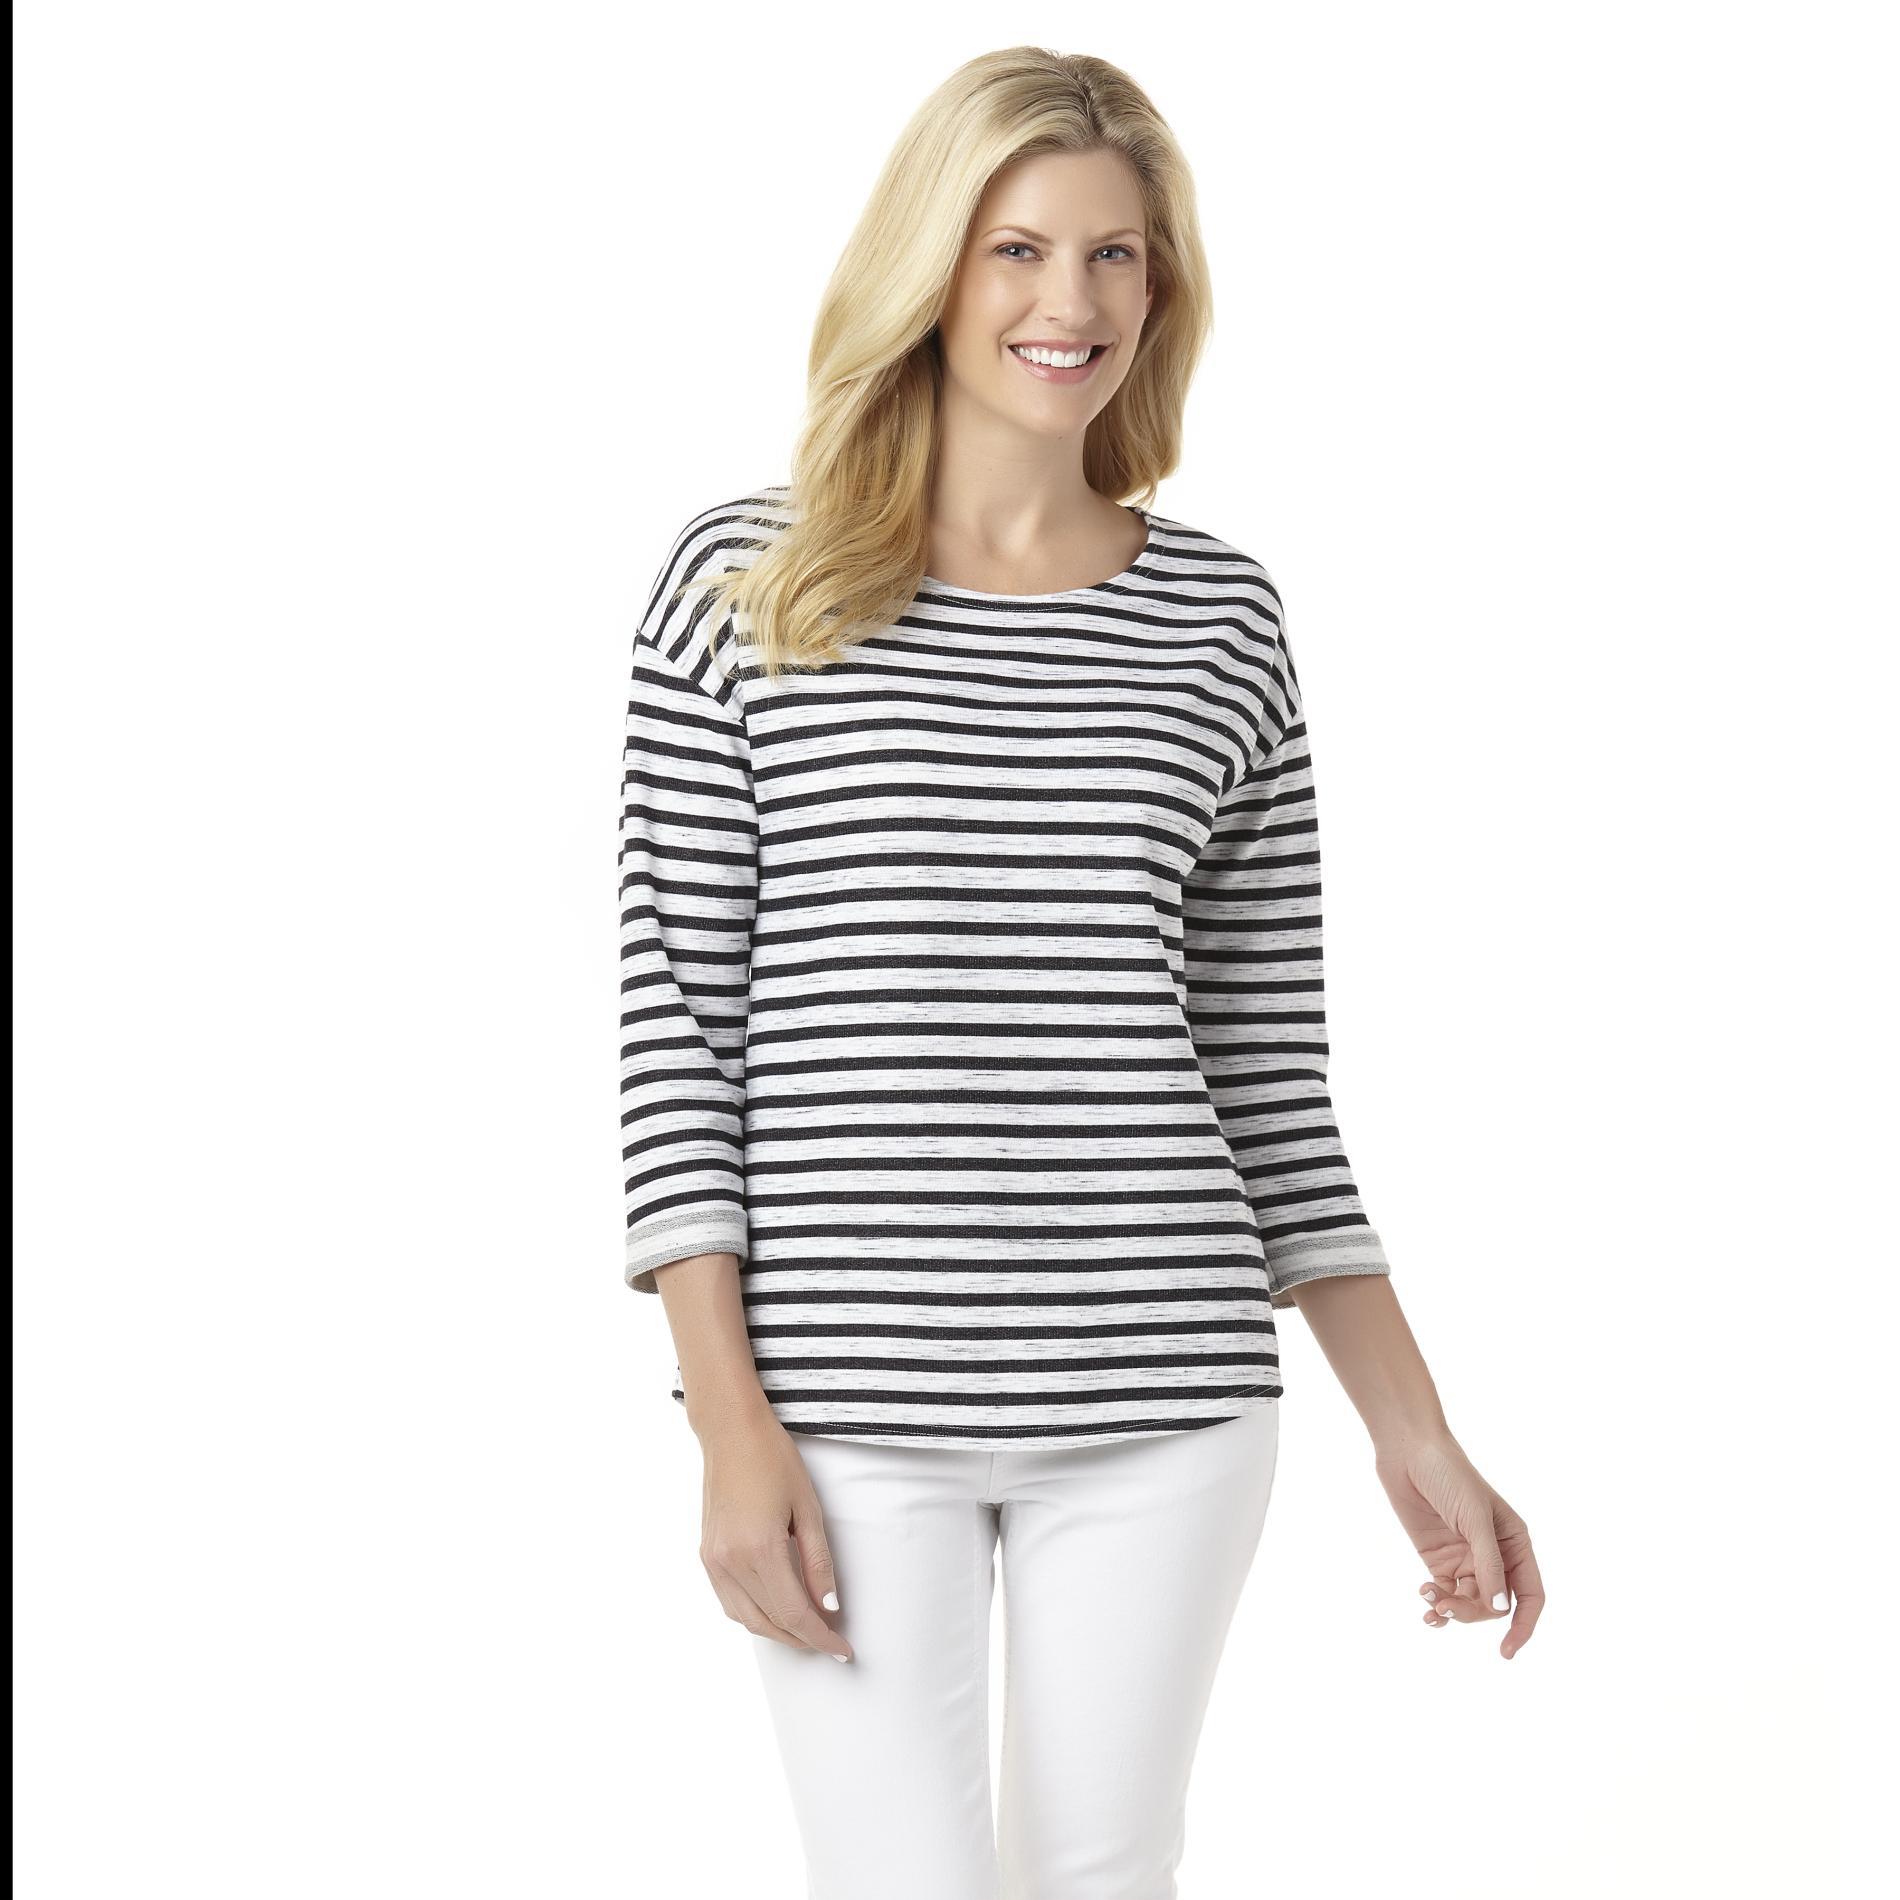 Basic Editions Women's Lightweight Sweatshirt - Striped